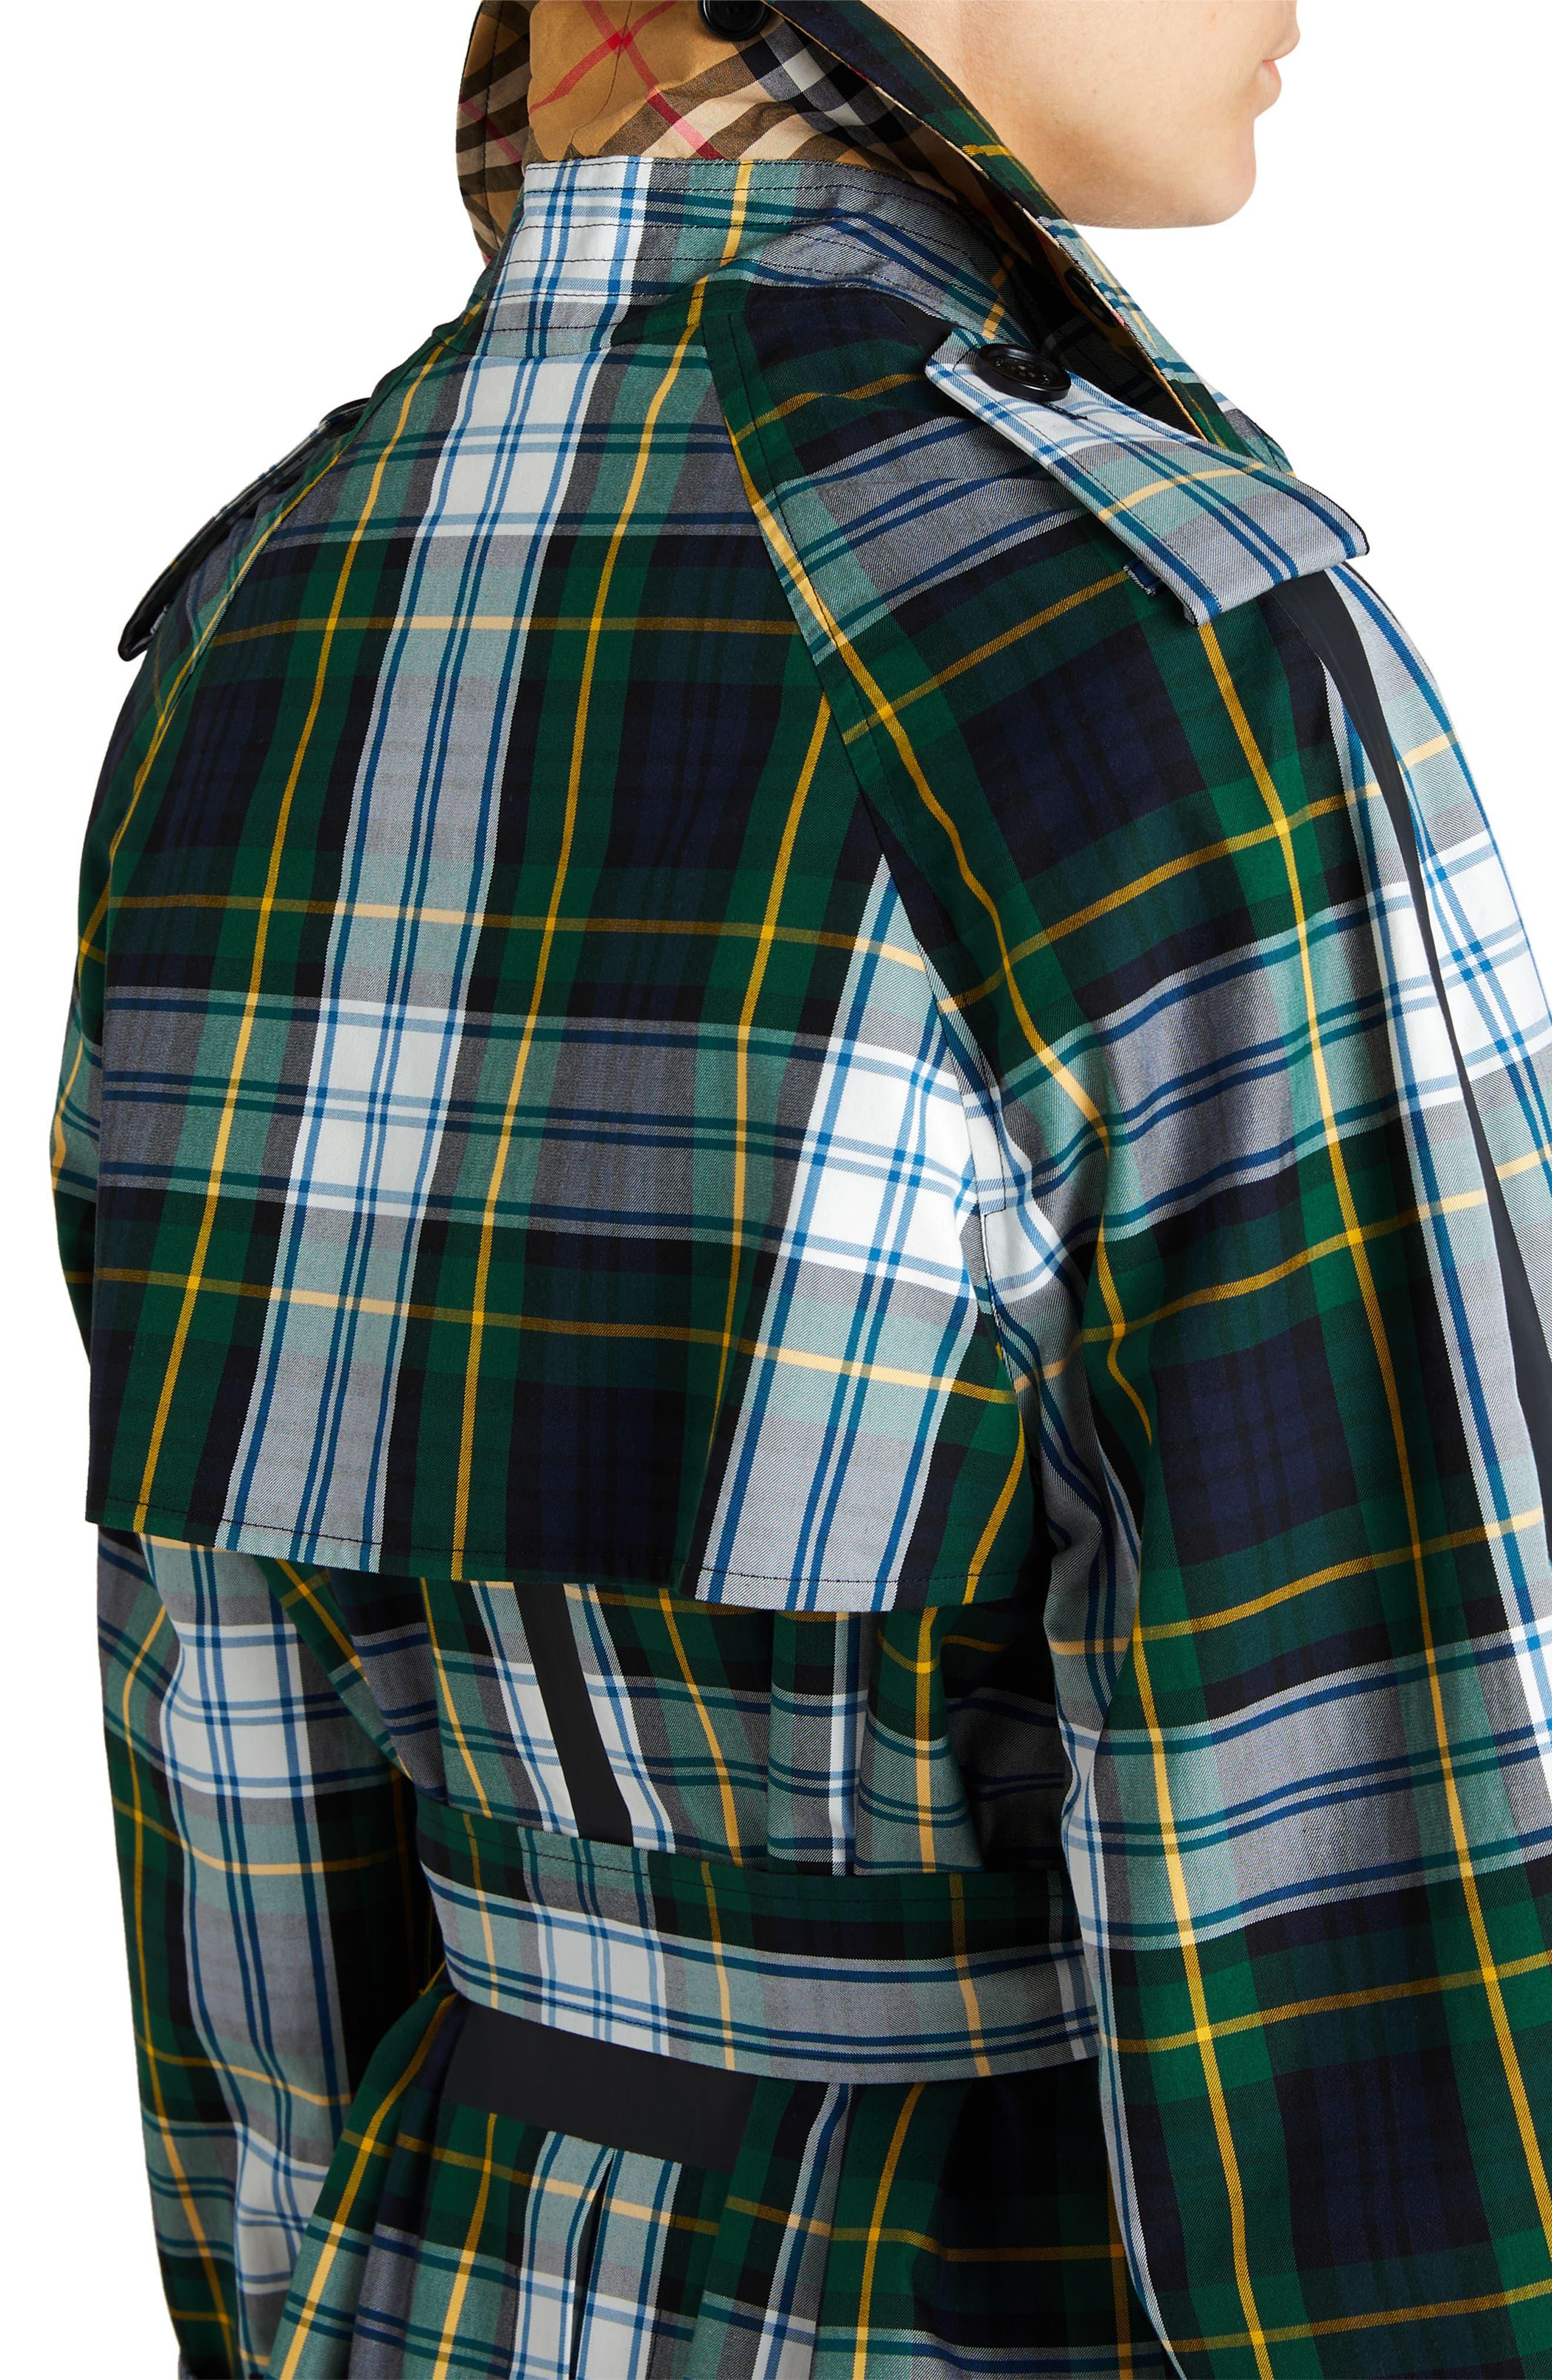 Tartan Cotton Gabardine Trench Coat,                             Alternate thumbnail 5, color,                             Ink Blue